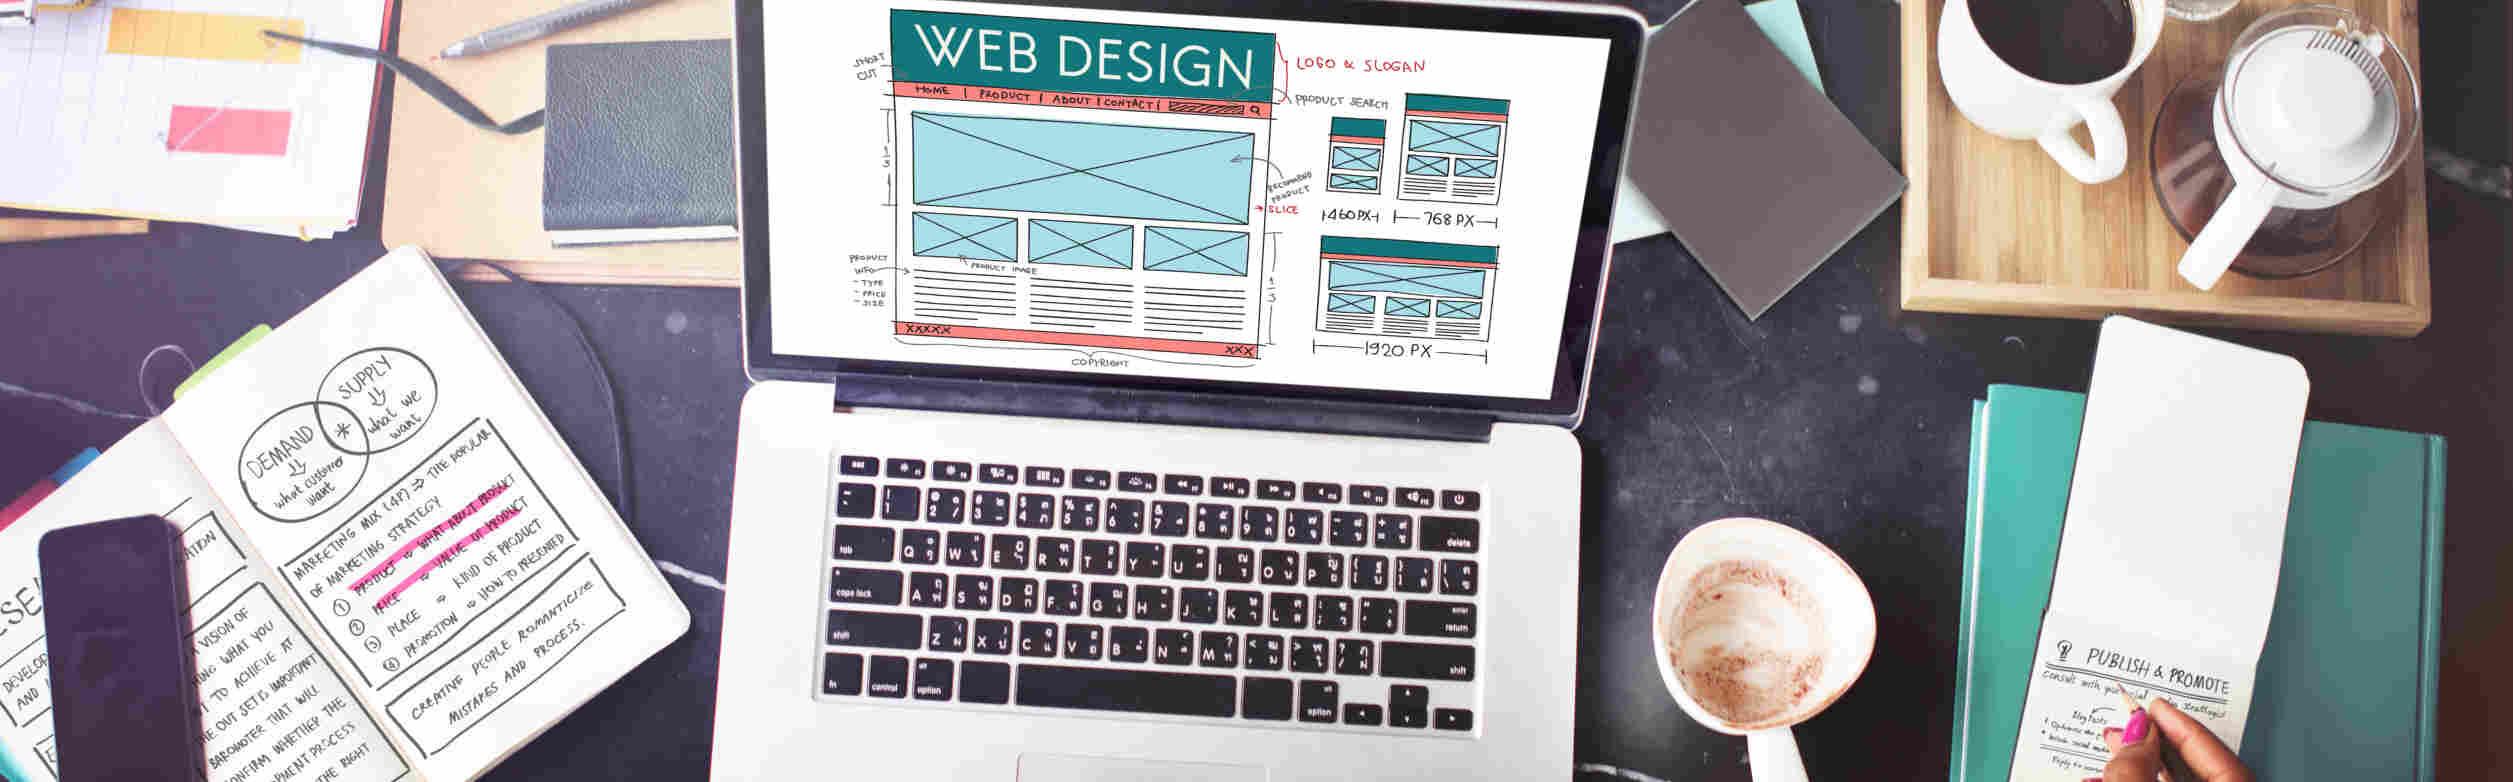 website-design-perks-for-healthcare-businesses